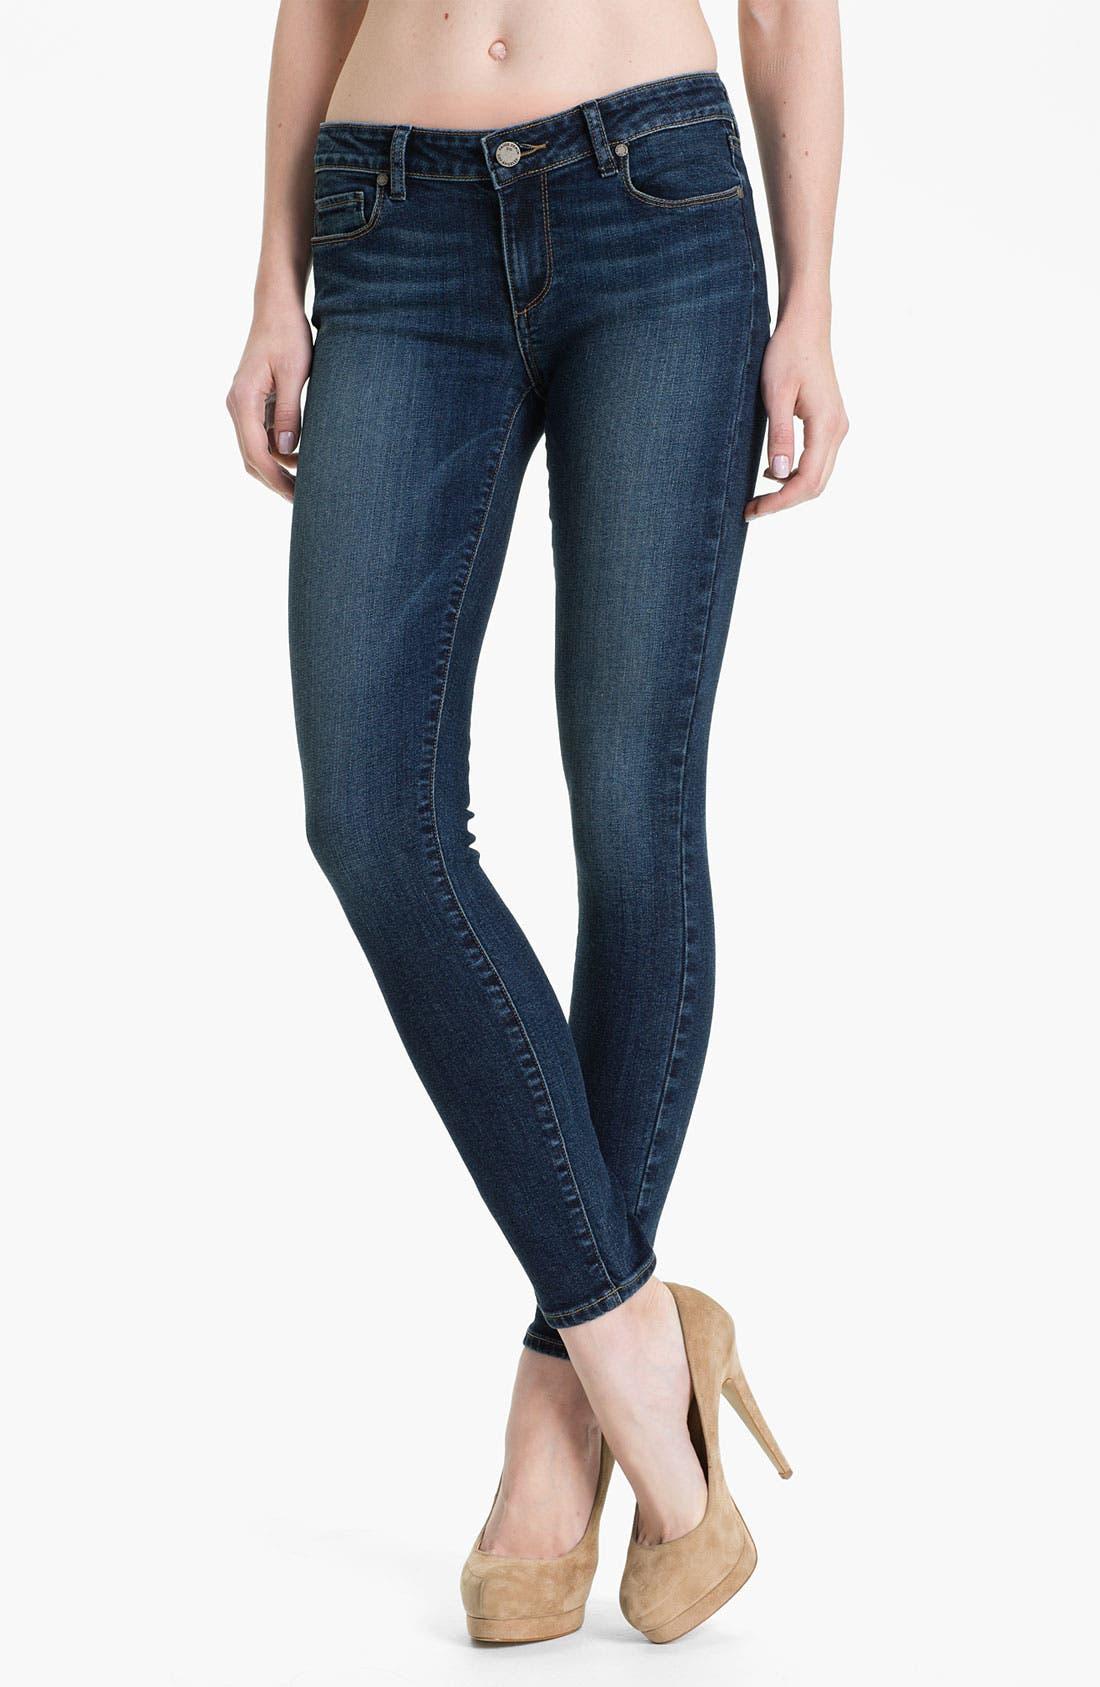 Alternate Image 1 Selected - Paige Denim 'Verdugo' Stretch Denim Skinny Jeans (Benny)